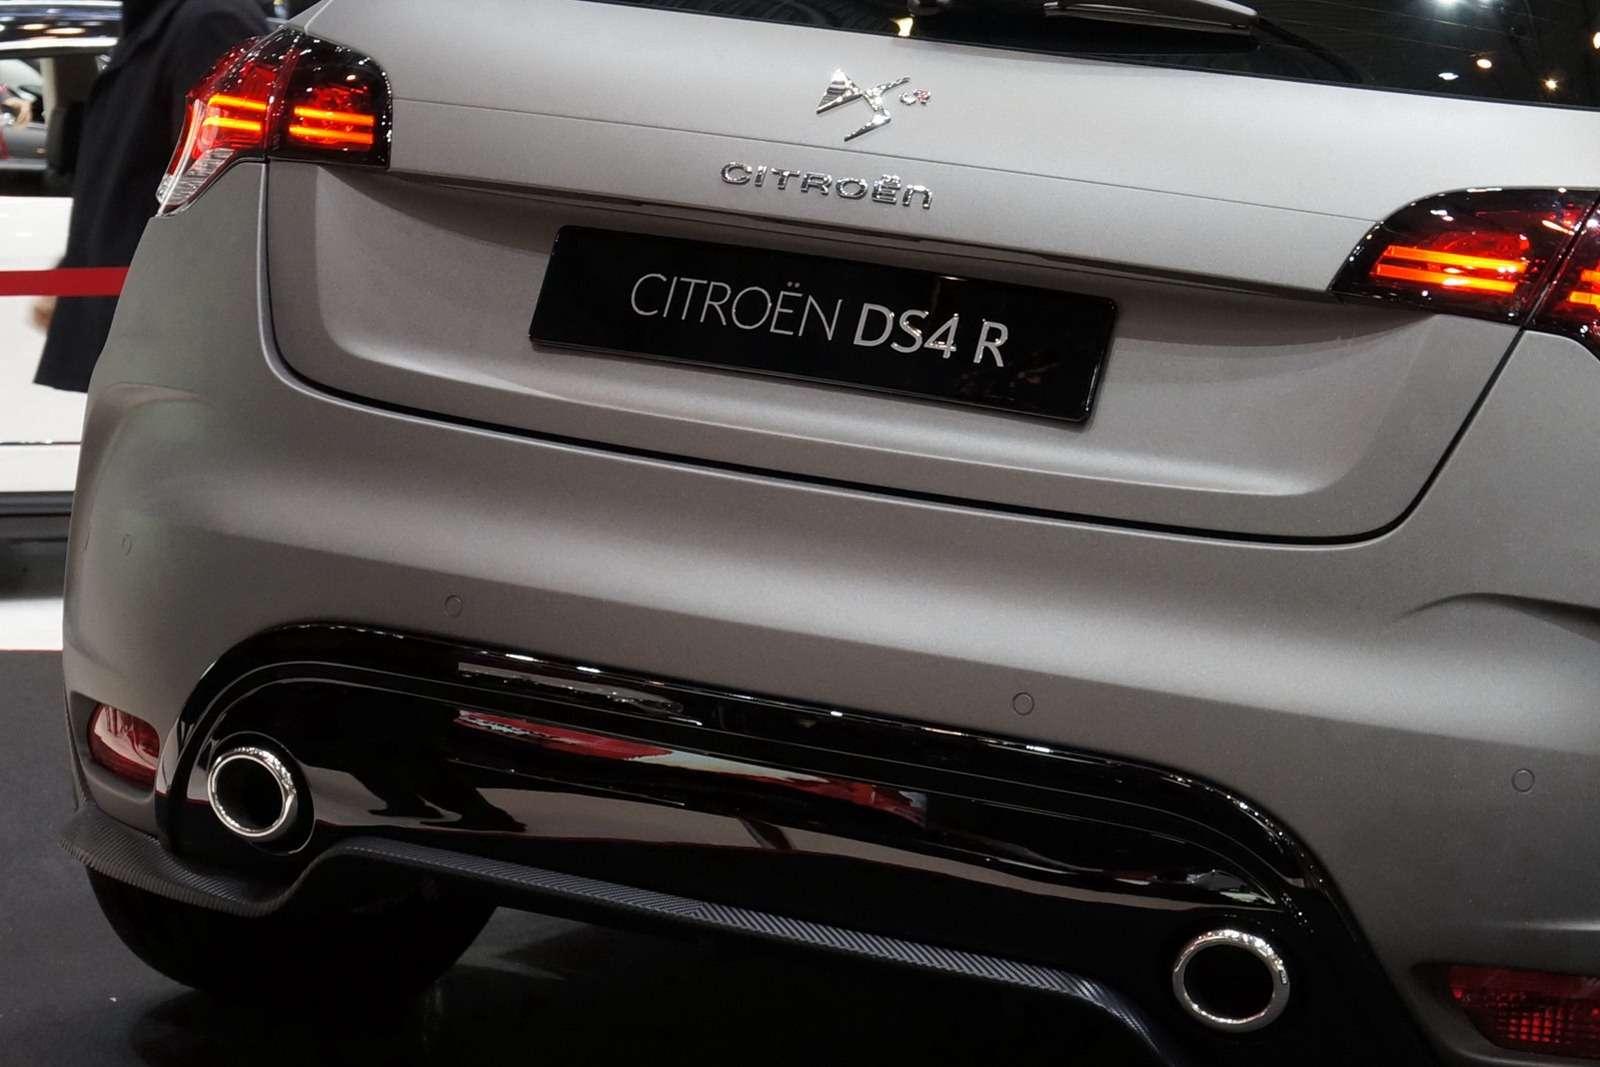 citroen-ds4-racing-genewa-2012_07.jpg